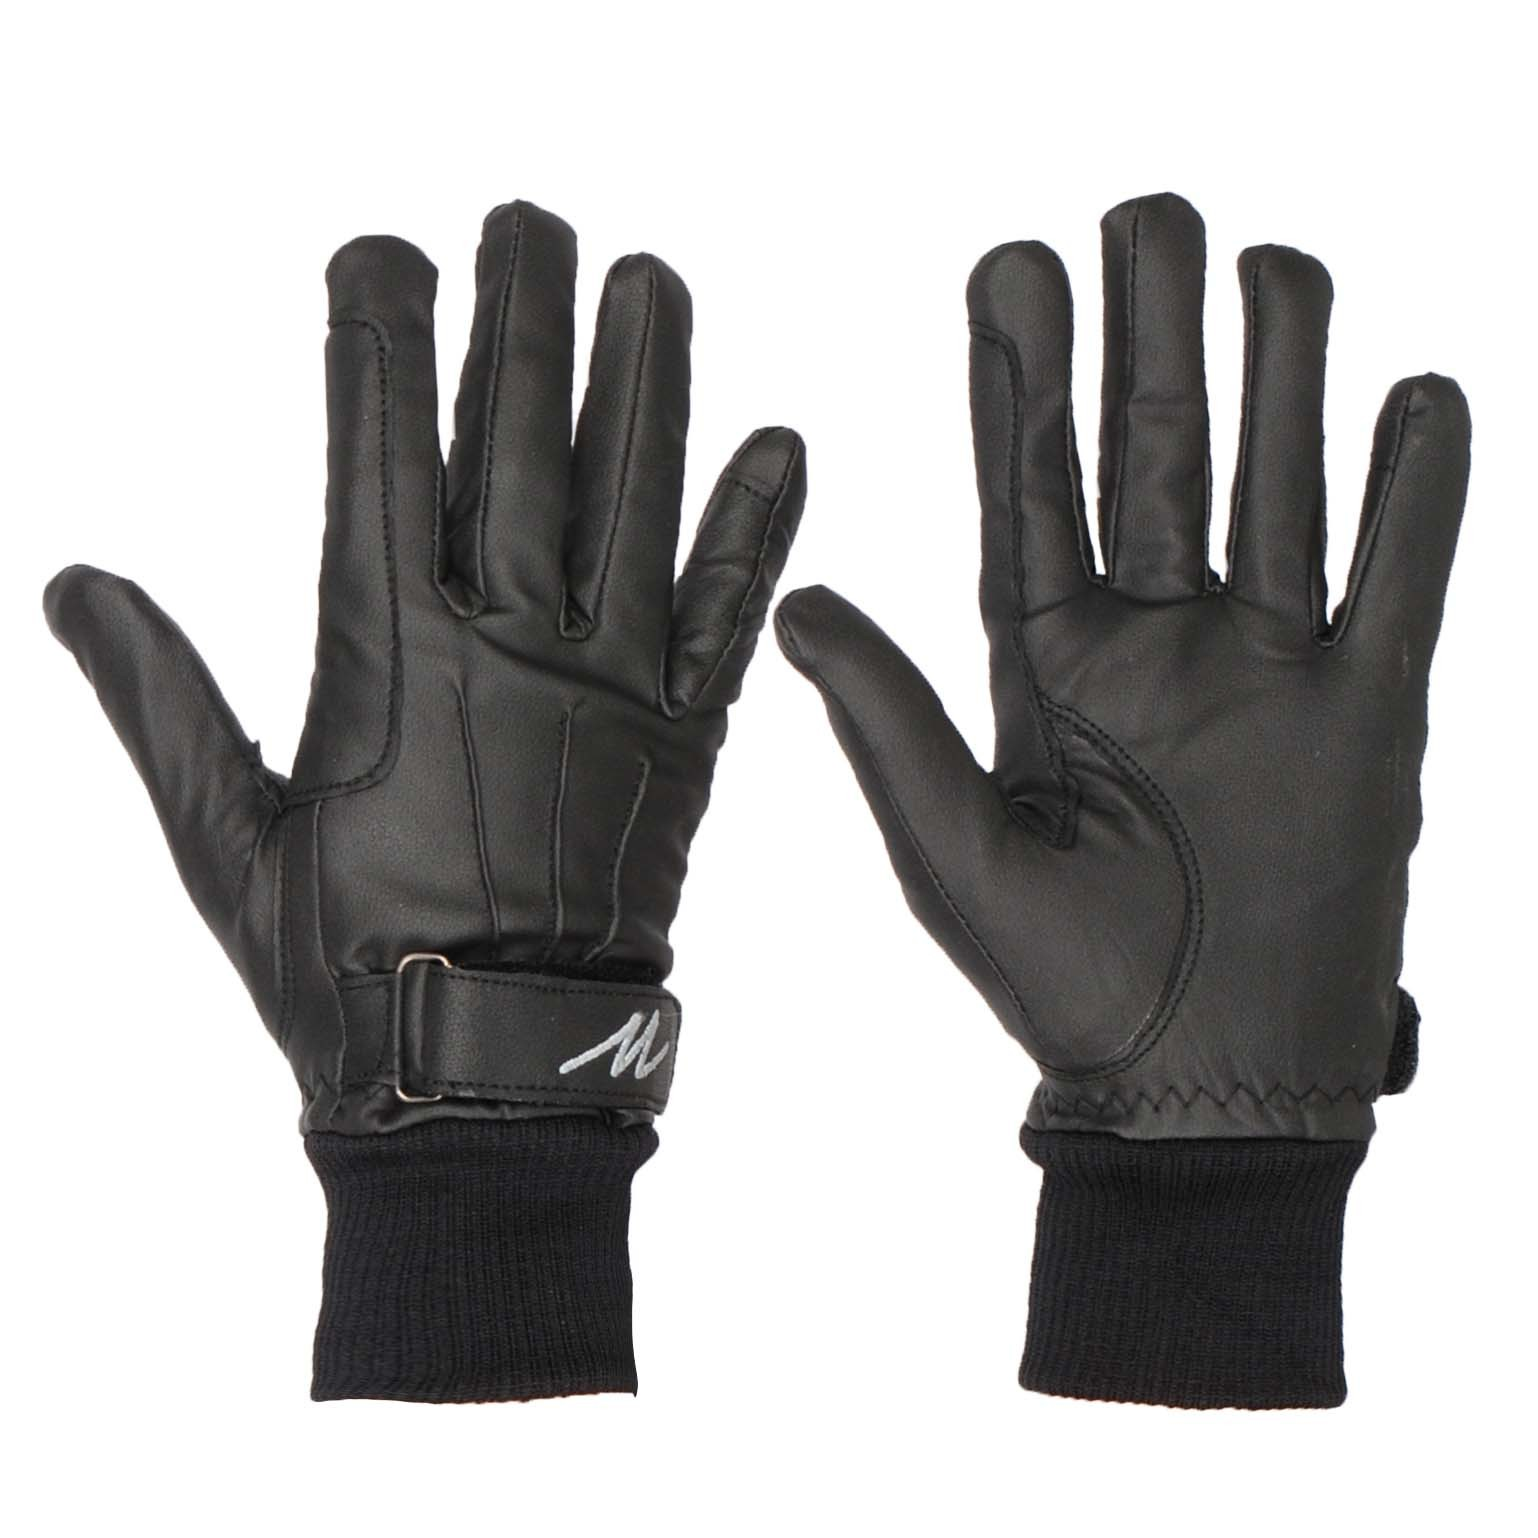 Mondoni Cordoba handschoenen zwart maat:xs